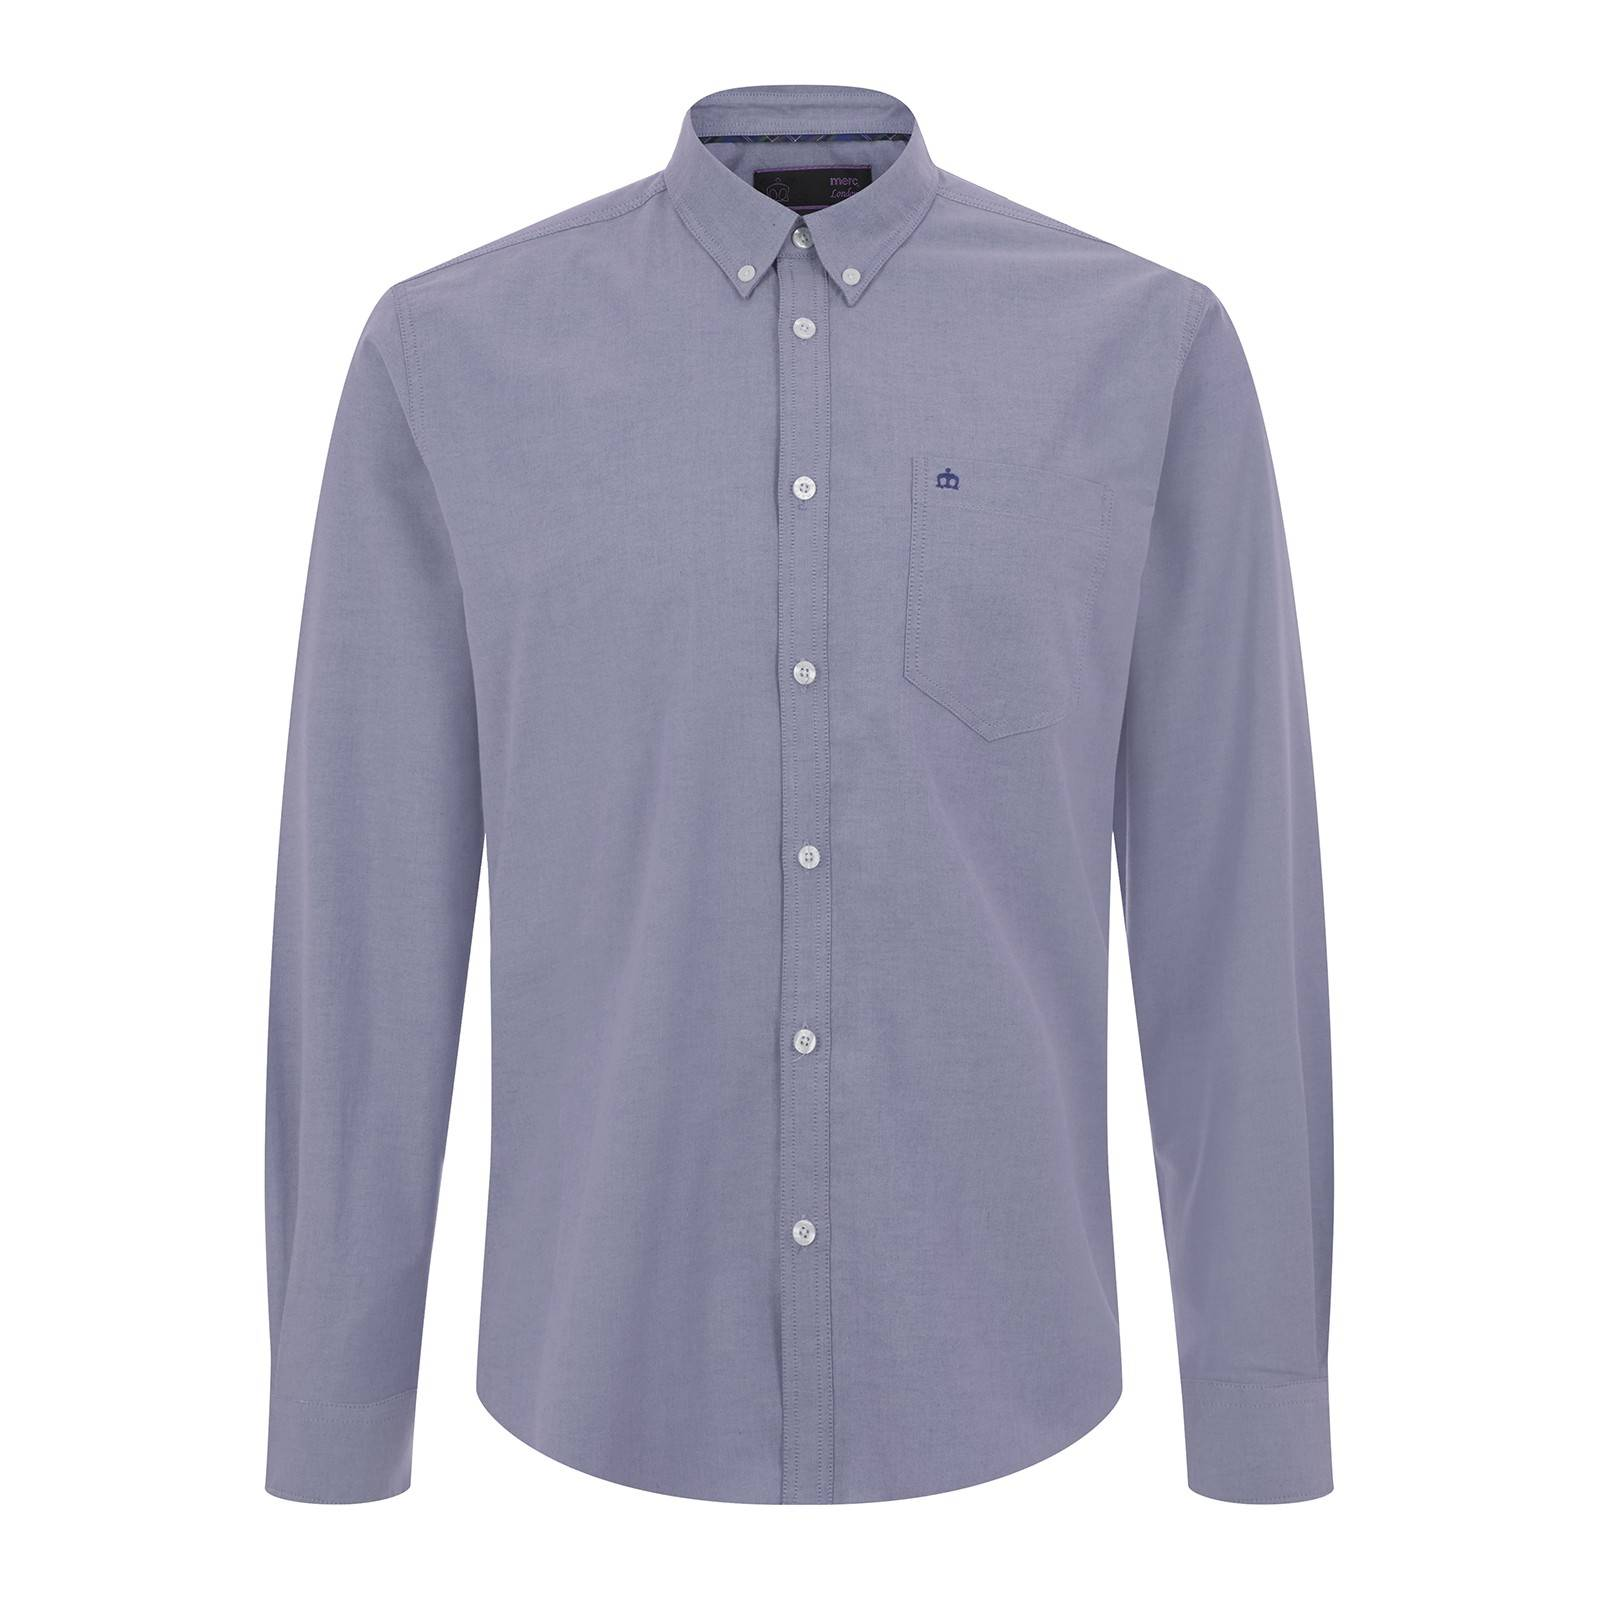 Рубашка Oval от MercLondon